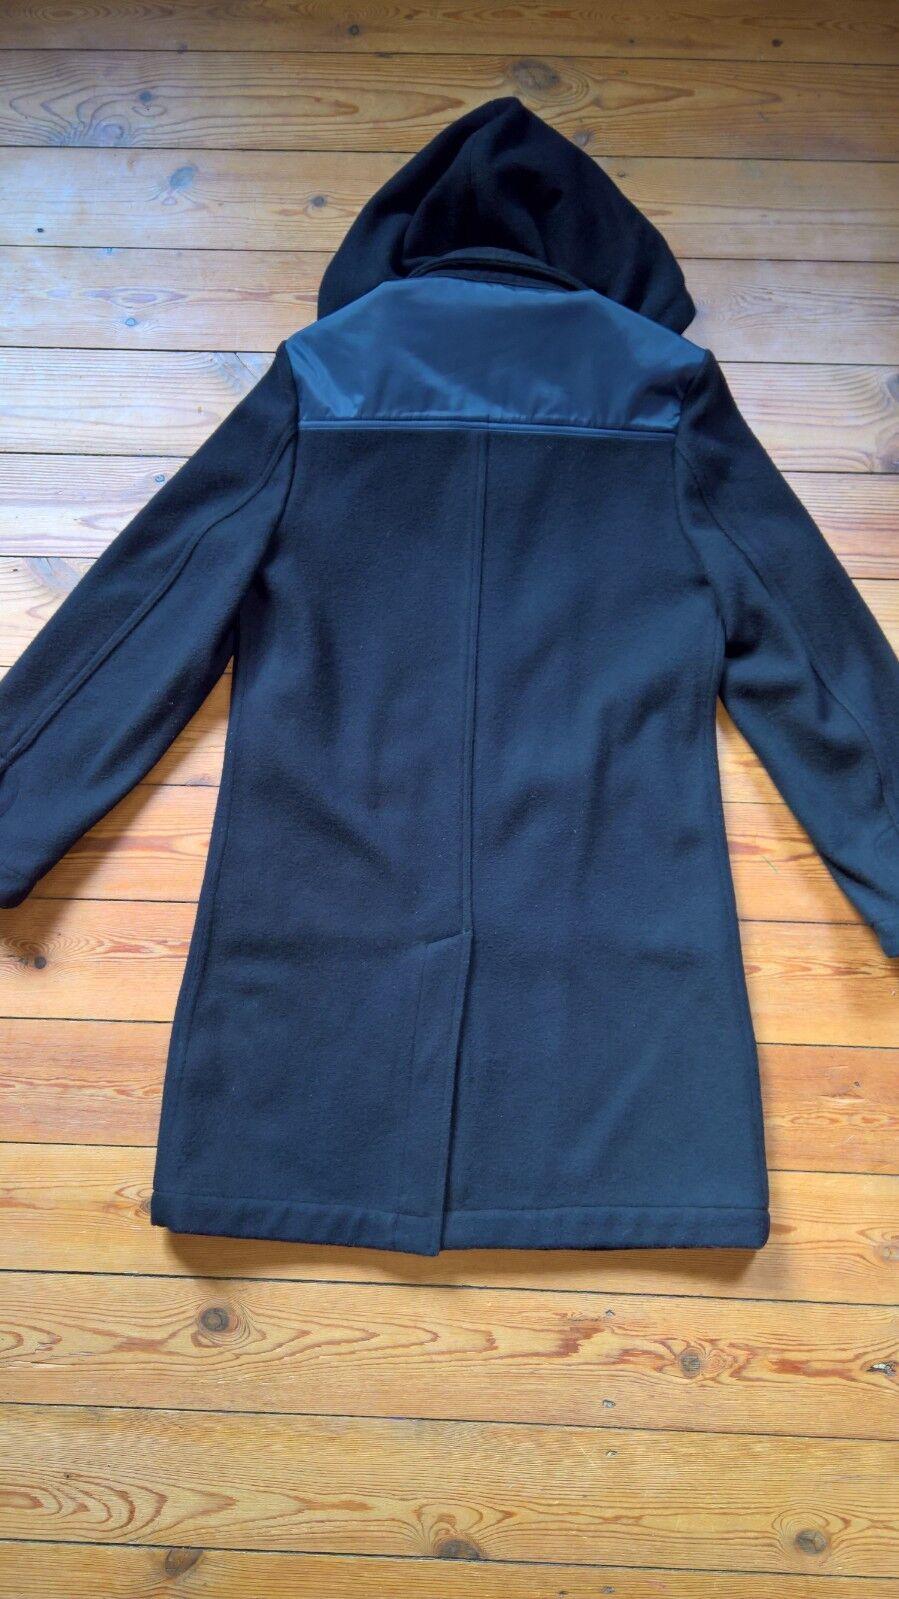 Donkey Coat Damen Damen Damen navy Gr. 38 vintage Pringle of Scotland Mantel Mod UK 50s   | Qualität Produkt  | Neuankömmling  | Erste Gruppe von Kunden  | Verrückte Preis  | Sonderangebot  d1270d